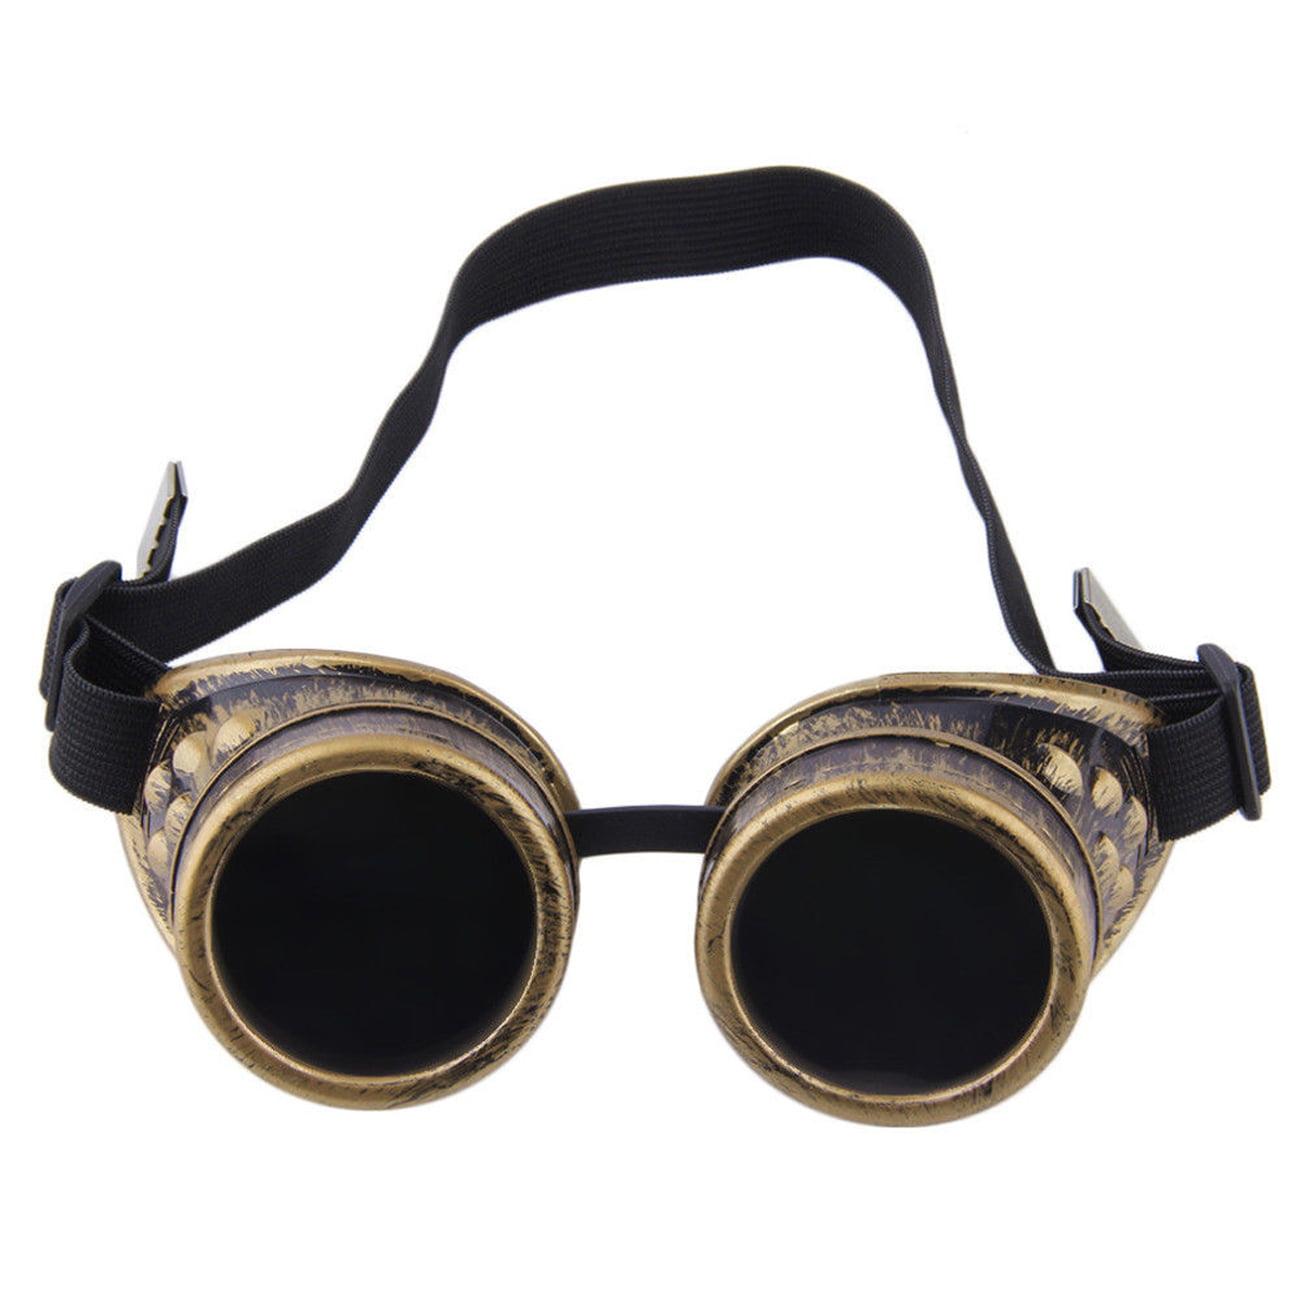 C.F.GOGGLE Retro Steampunk Goggles Welding Halloween Gothic Cosplay Glasses